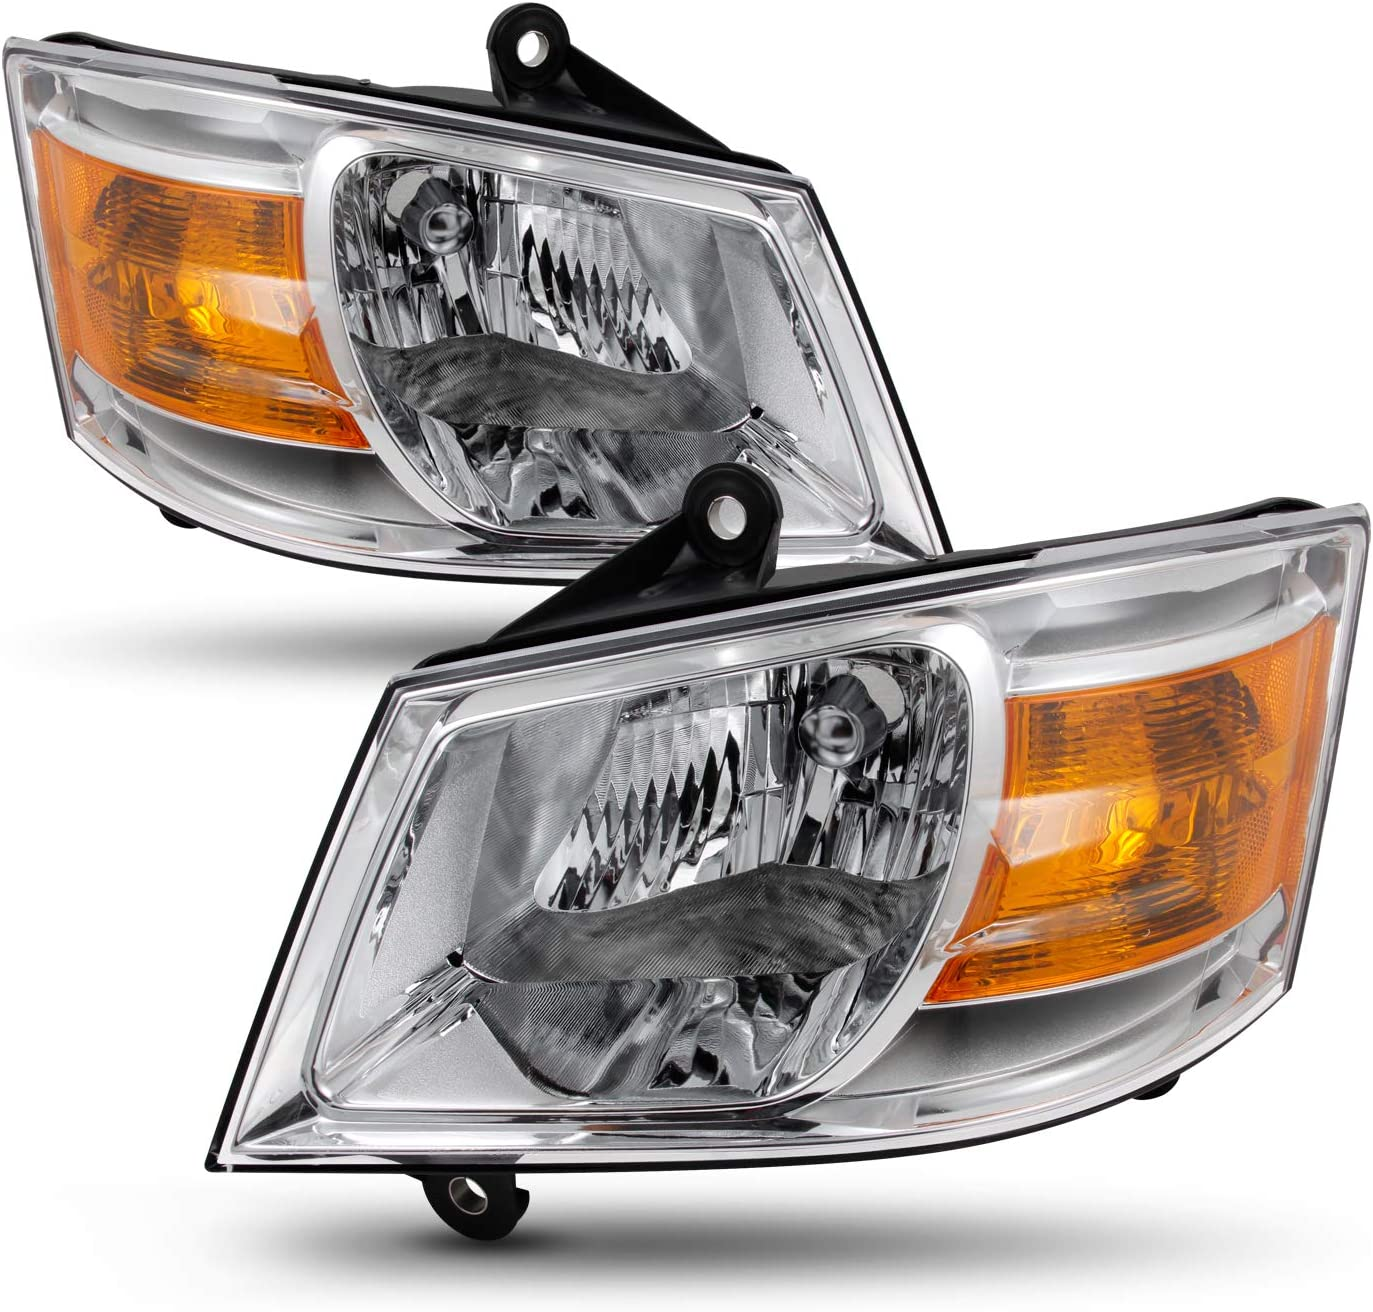 For Dodge Grand Caravan 2008 2009 2010 H13 LED Headlight Hi//Lo Beam Bulbs 8000K